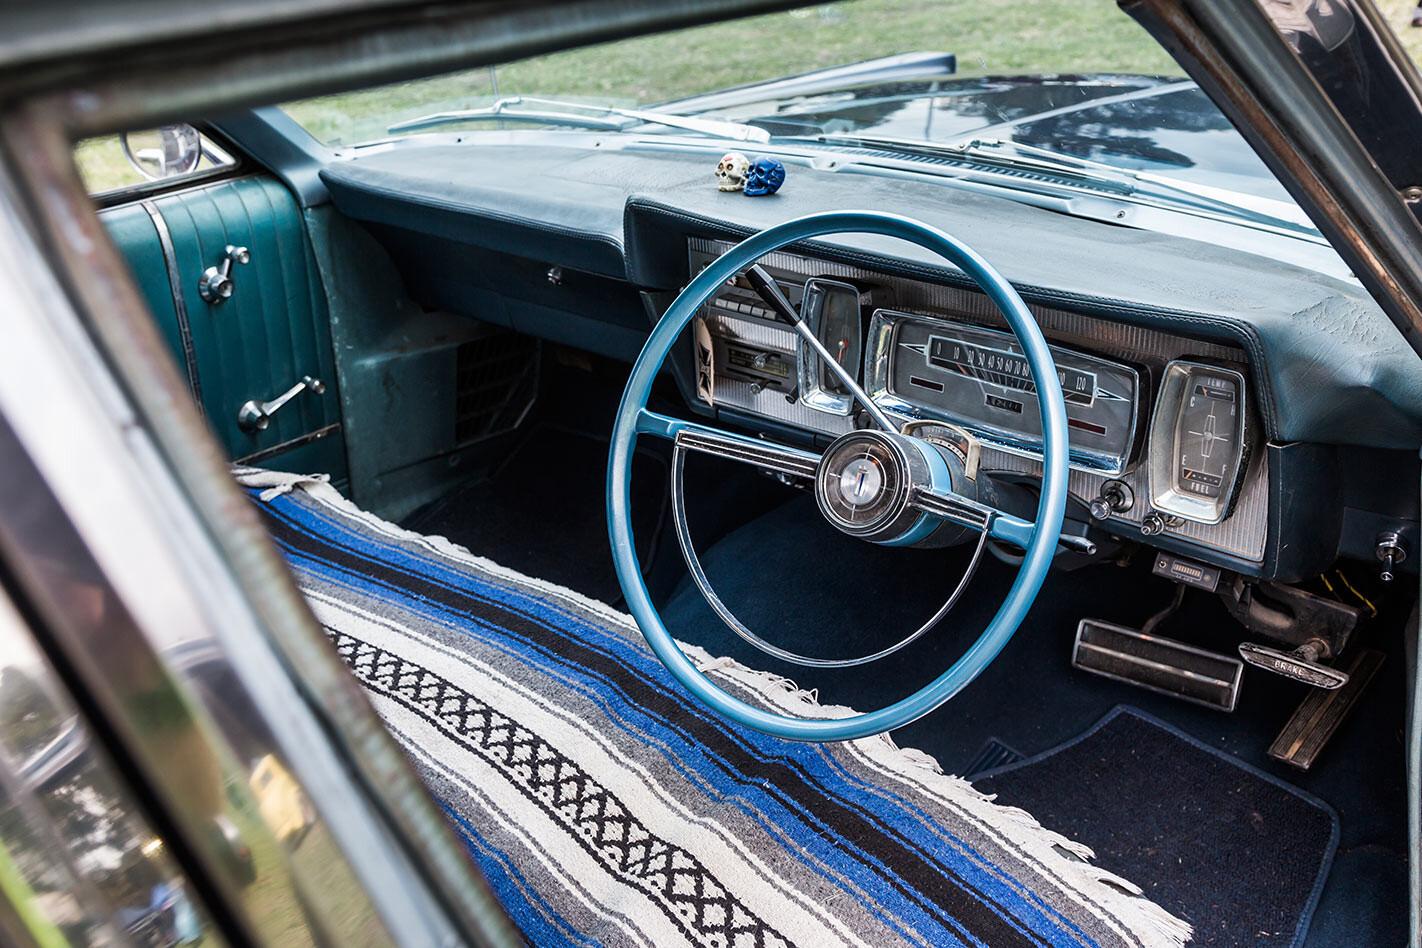 Ford Galaxie wagon interior